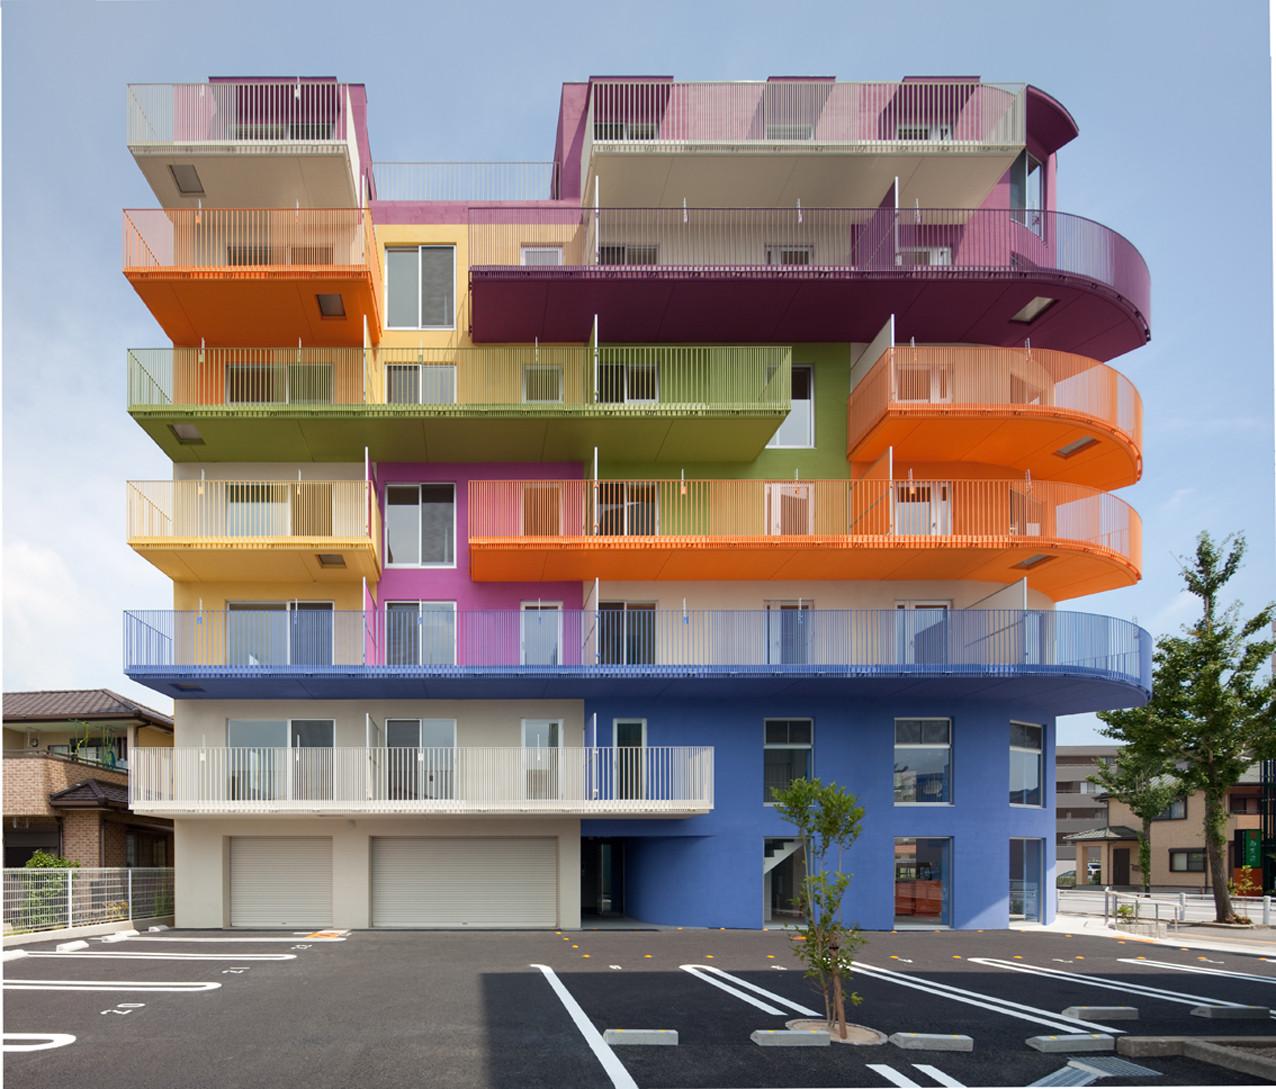 Archivo: Arquitectura Multicolor / Parte 2, © Toshihisa Iishi